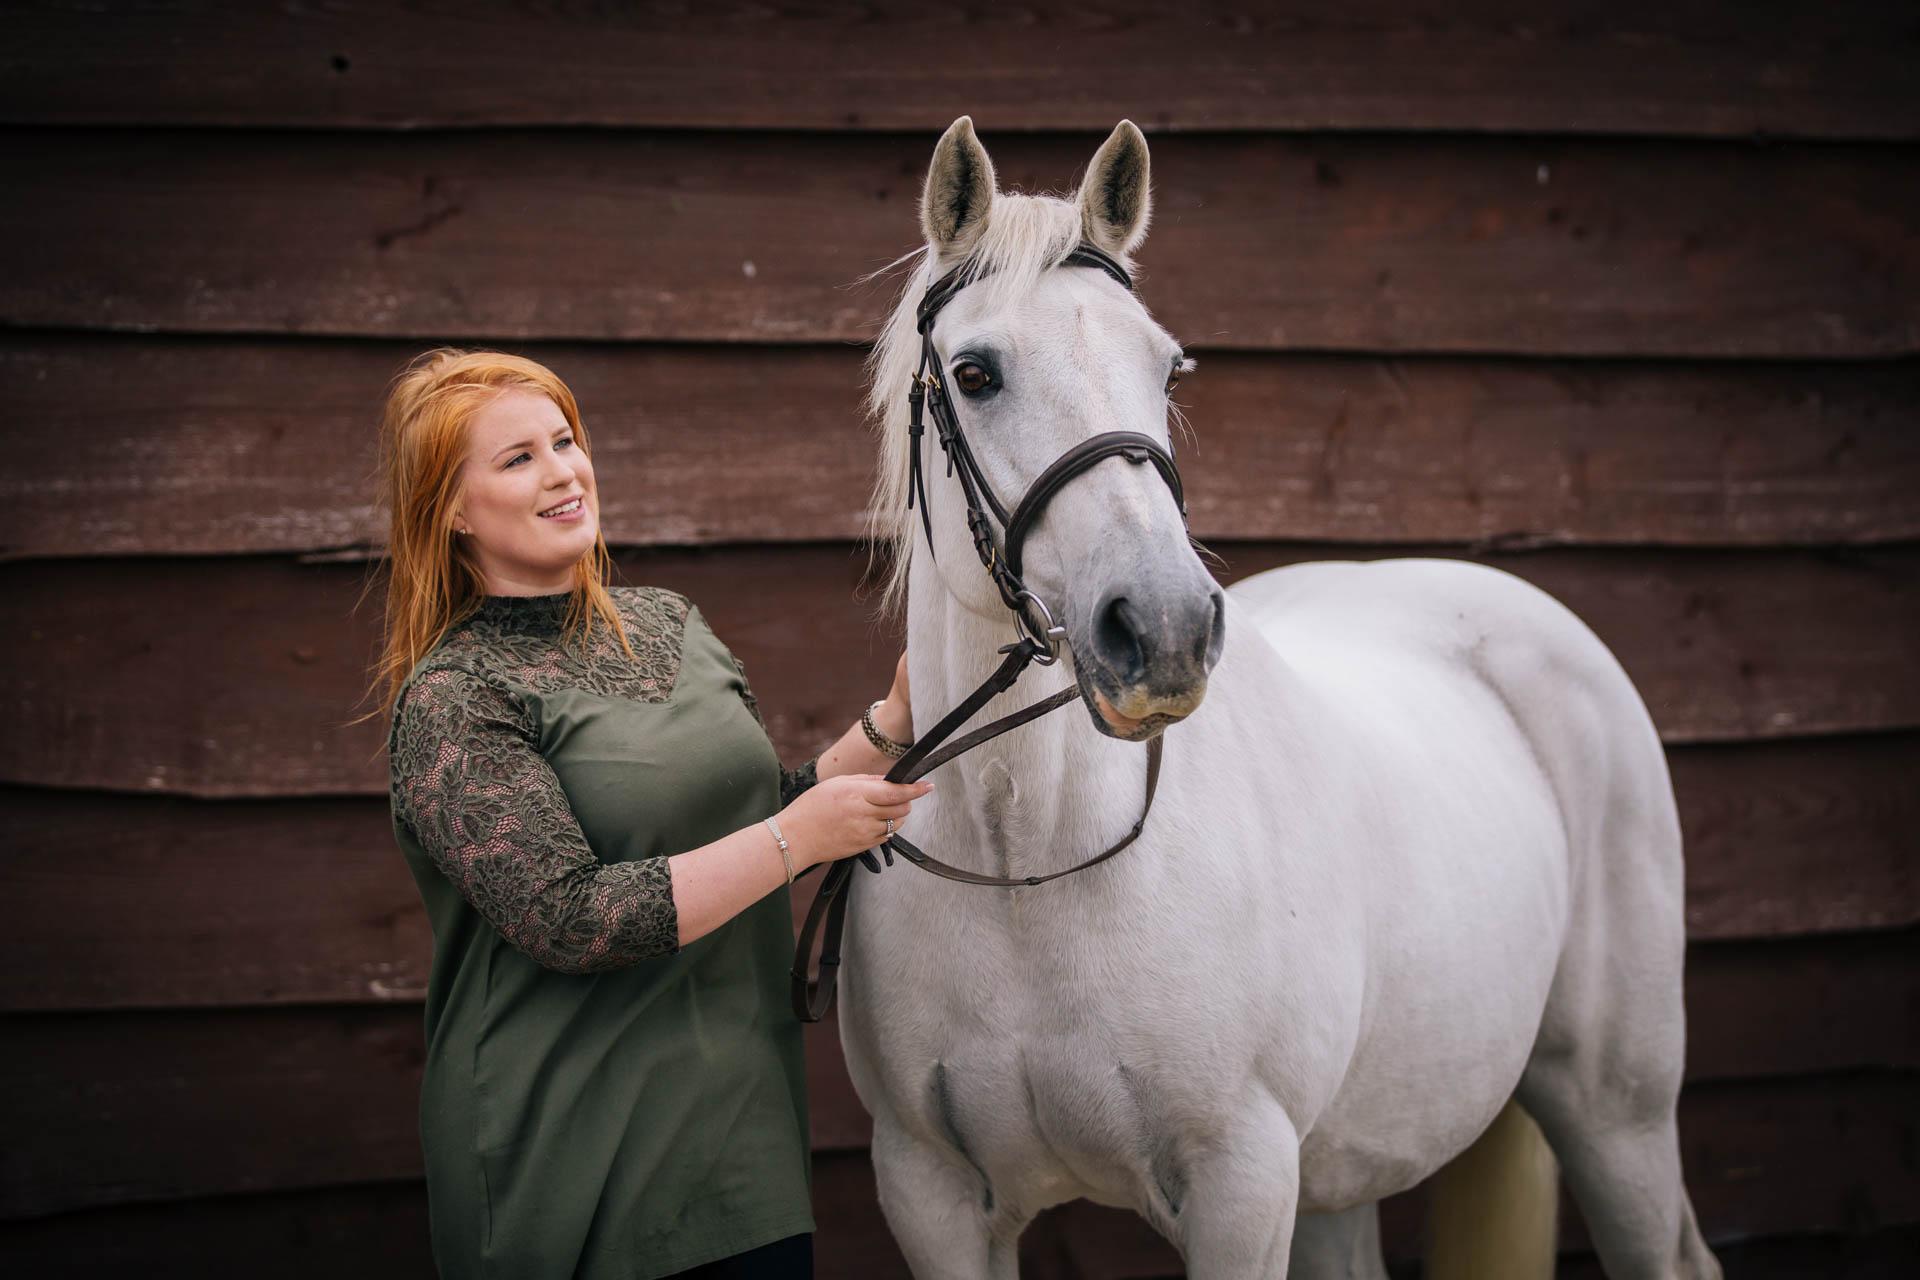 Equine Portraits at the Yard Joanna Eardley